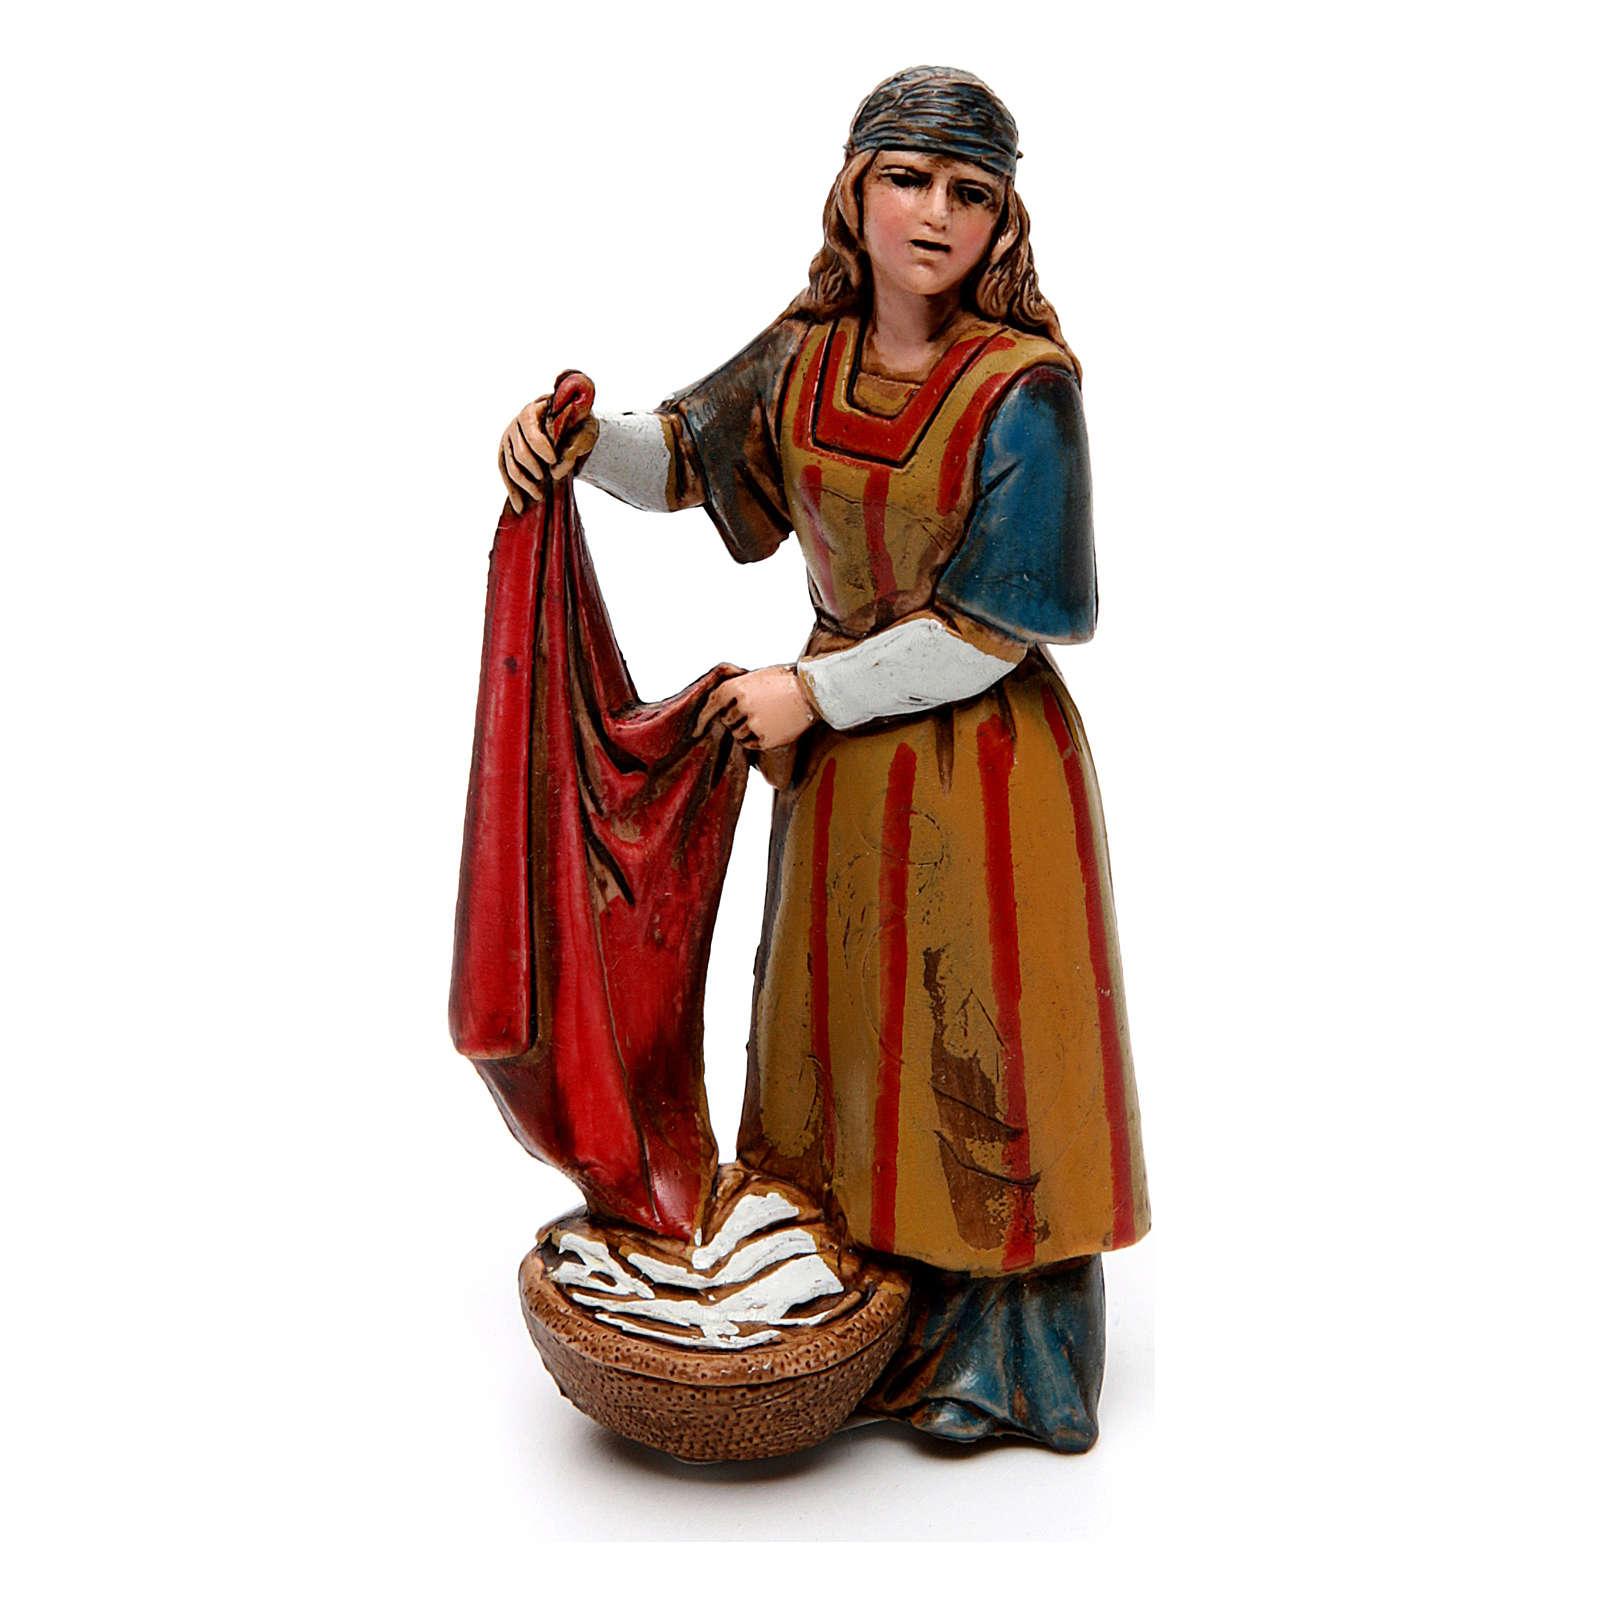 Neapolitan customs and trades, 3 nativity figurine, 10cm Moranduzzo 4